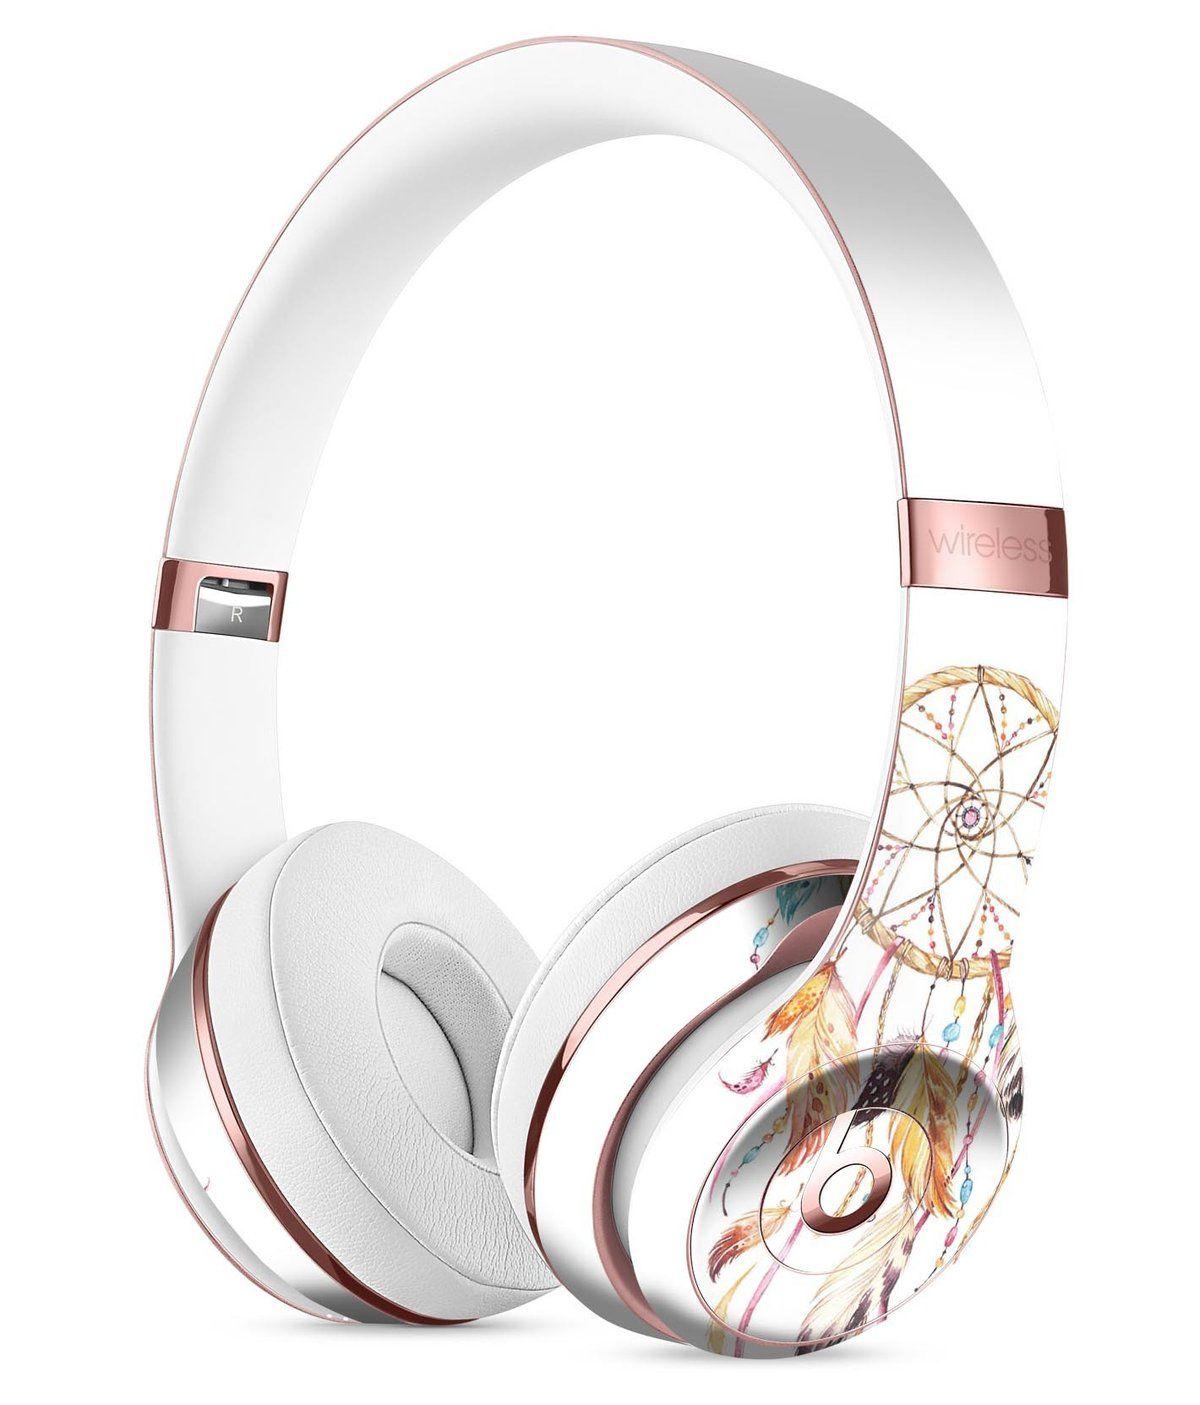 Watercolor Dreamcatchers V8 Full Body Skin Kit For The Beats By Dre Solo 3 Wireless Headphones Wireless Headphones Cute Headphones Headphones